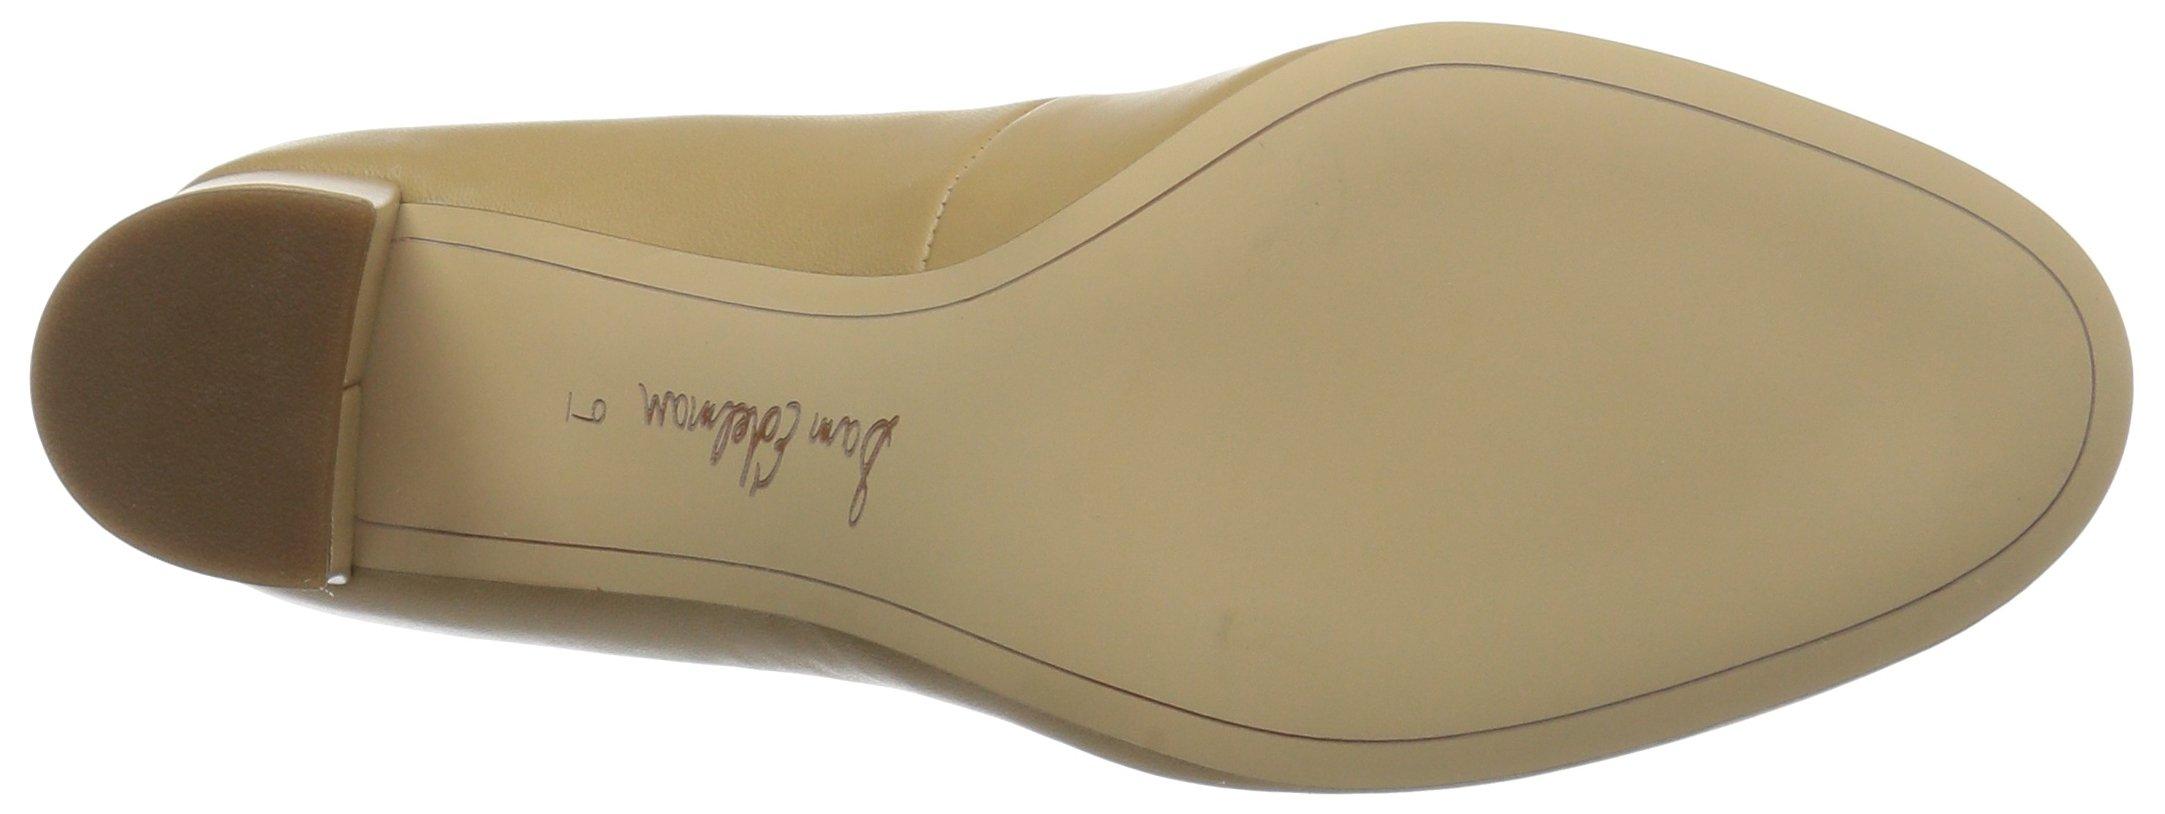 Sam Edelman Women's Stillson Pump, Classic Nude Leather, 7.5 Medium US by Sam Edelman (Image #3)